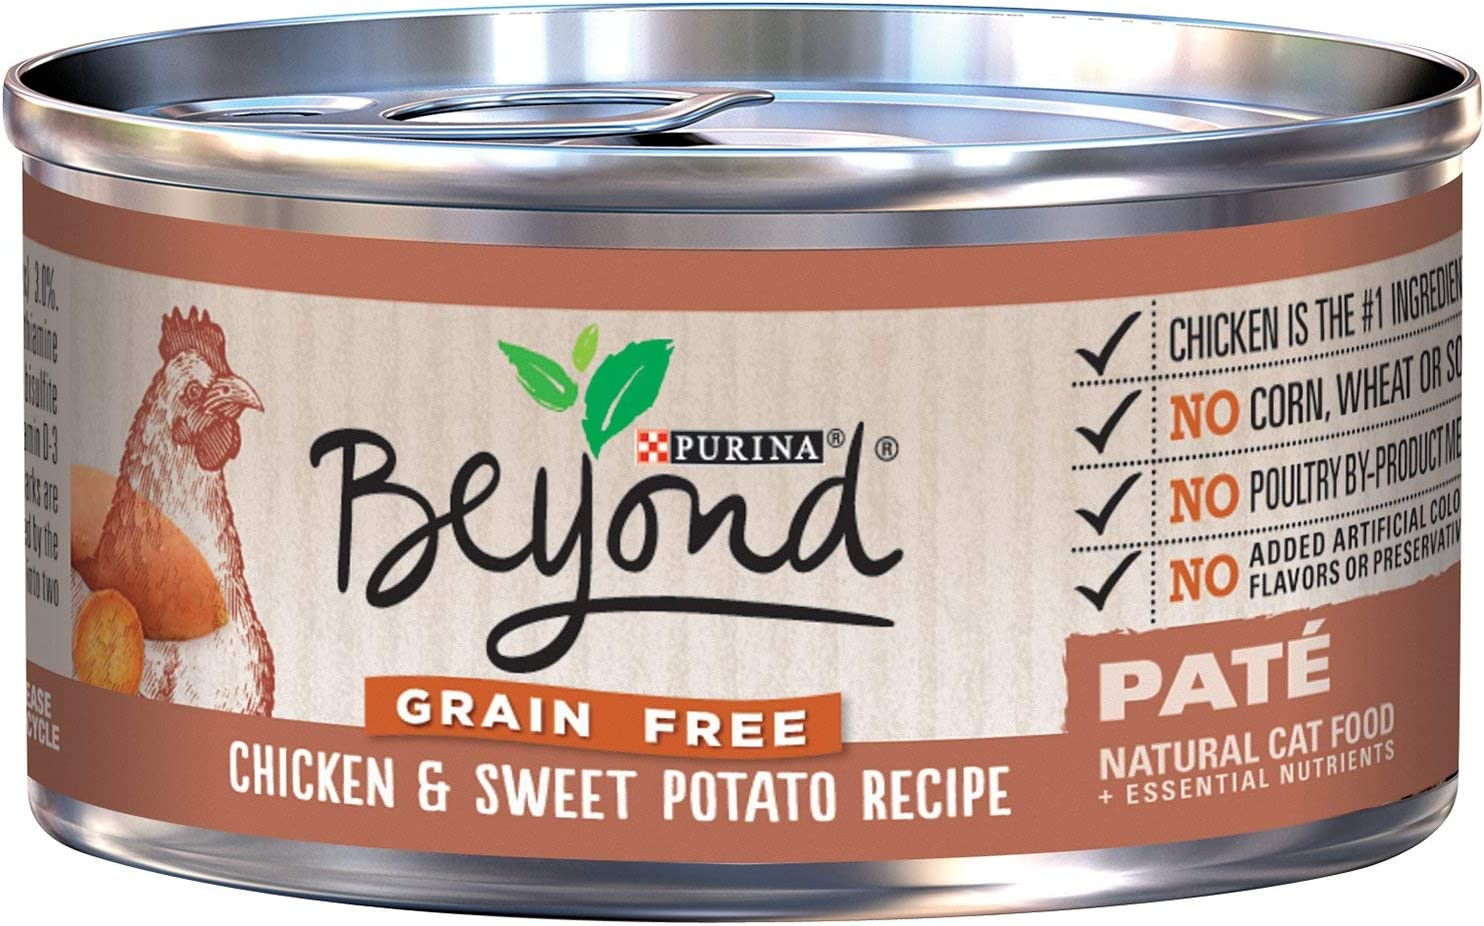 Purina Beyond Best Natural Wet Cat Food Grain Free (12 Pack) 3 oz,Can Treats Favorites Wellness Feast Nutrition Gourmet